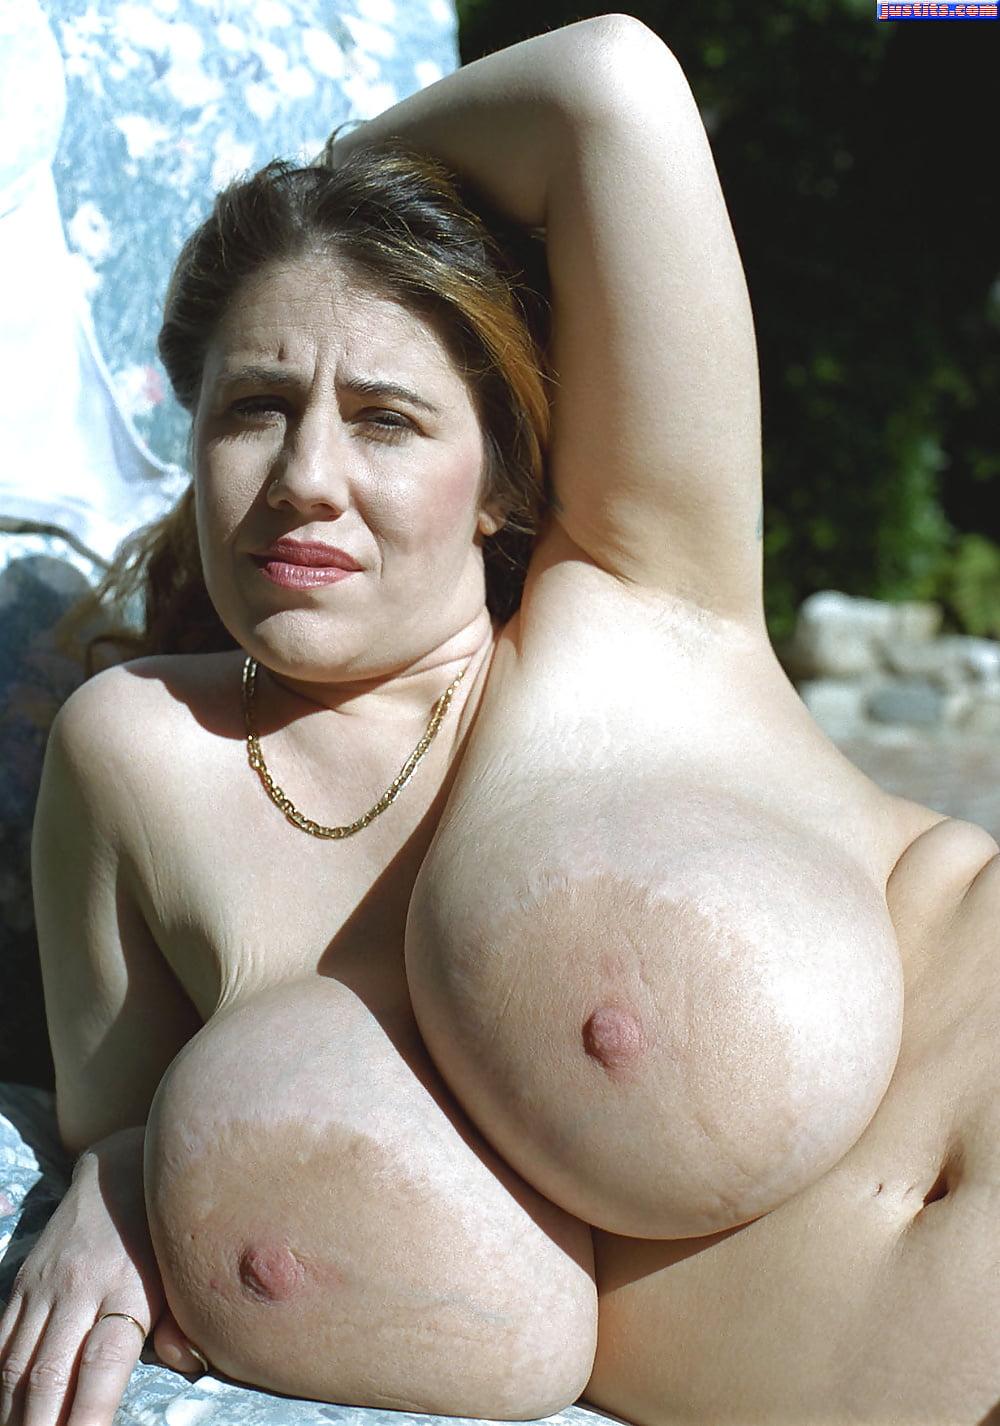 scam-mature-huge-natural-monster-tits